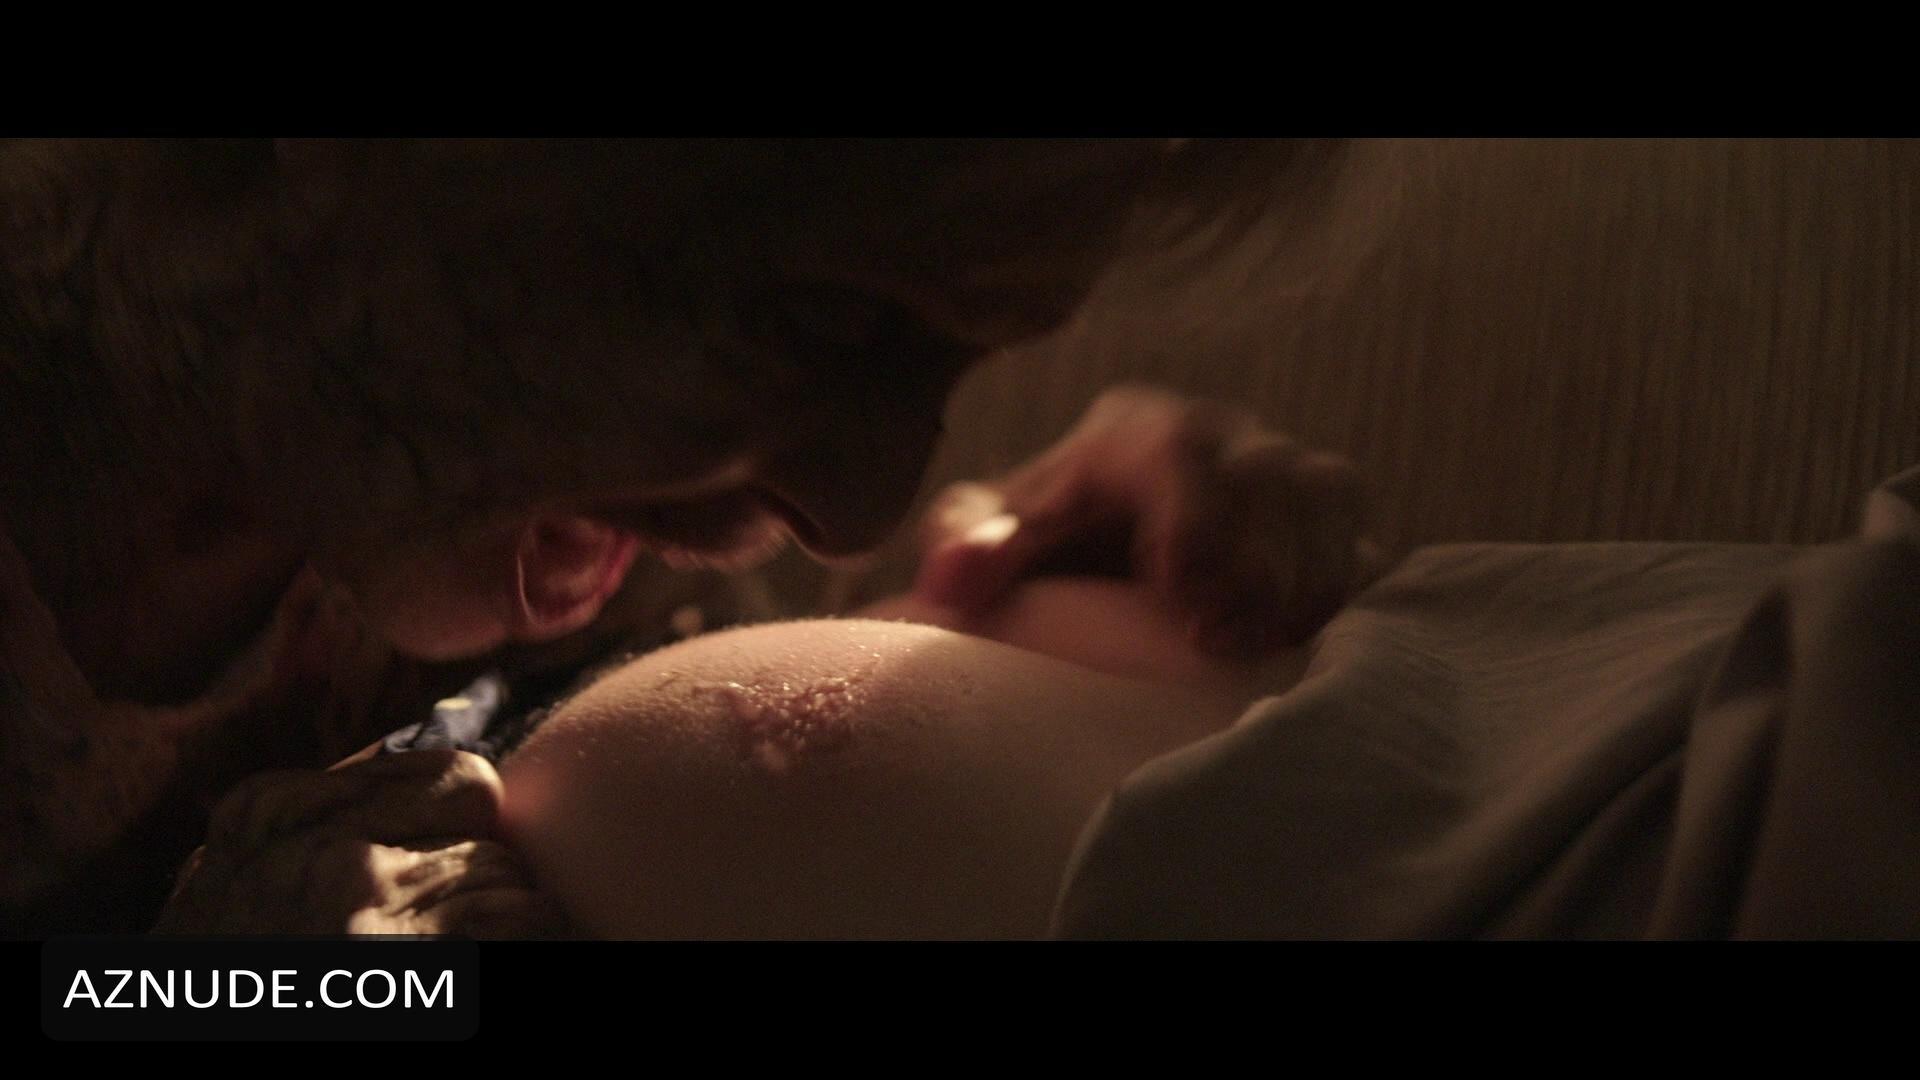 images of women zombie movies nude scenes